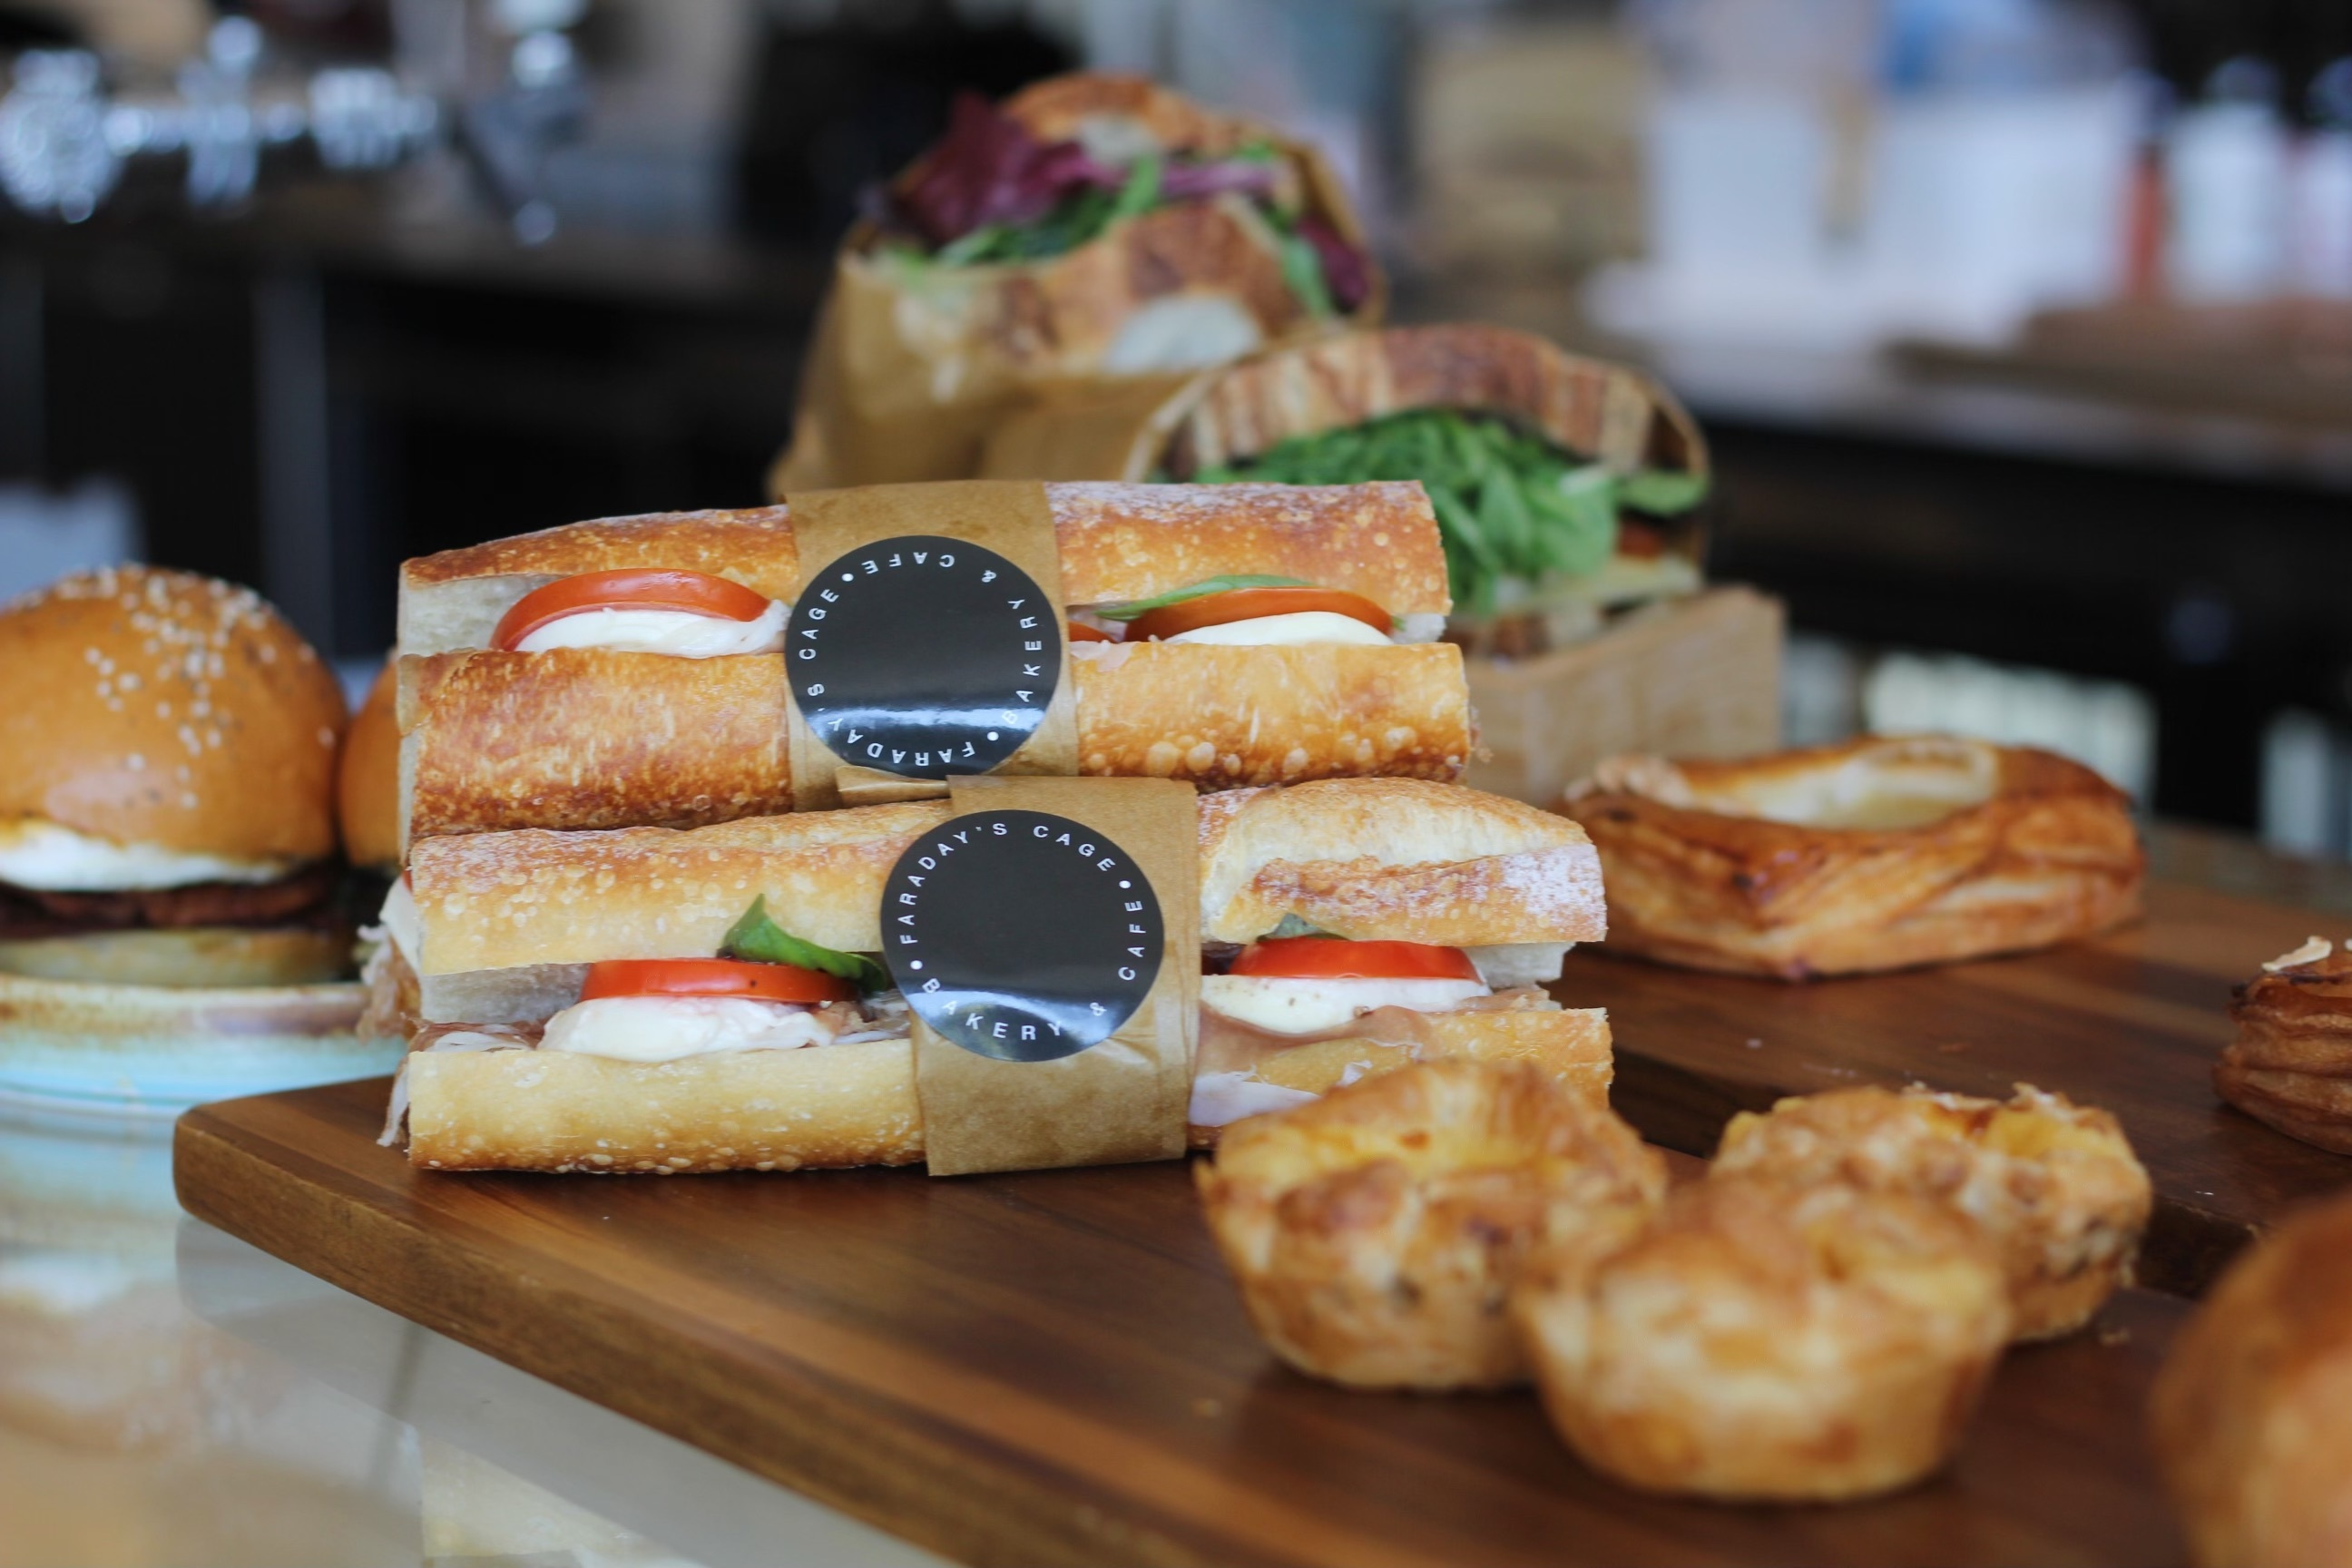 Faraday's Cage Fitzroy sandwiches